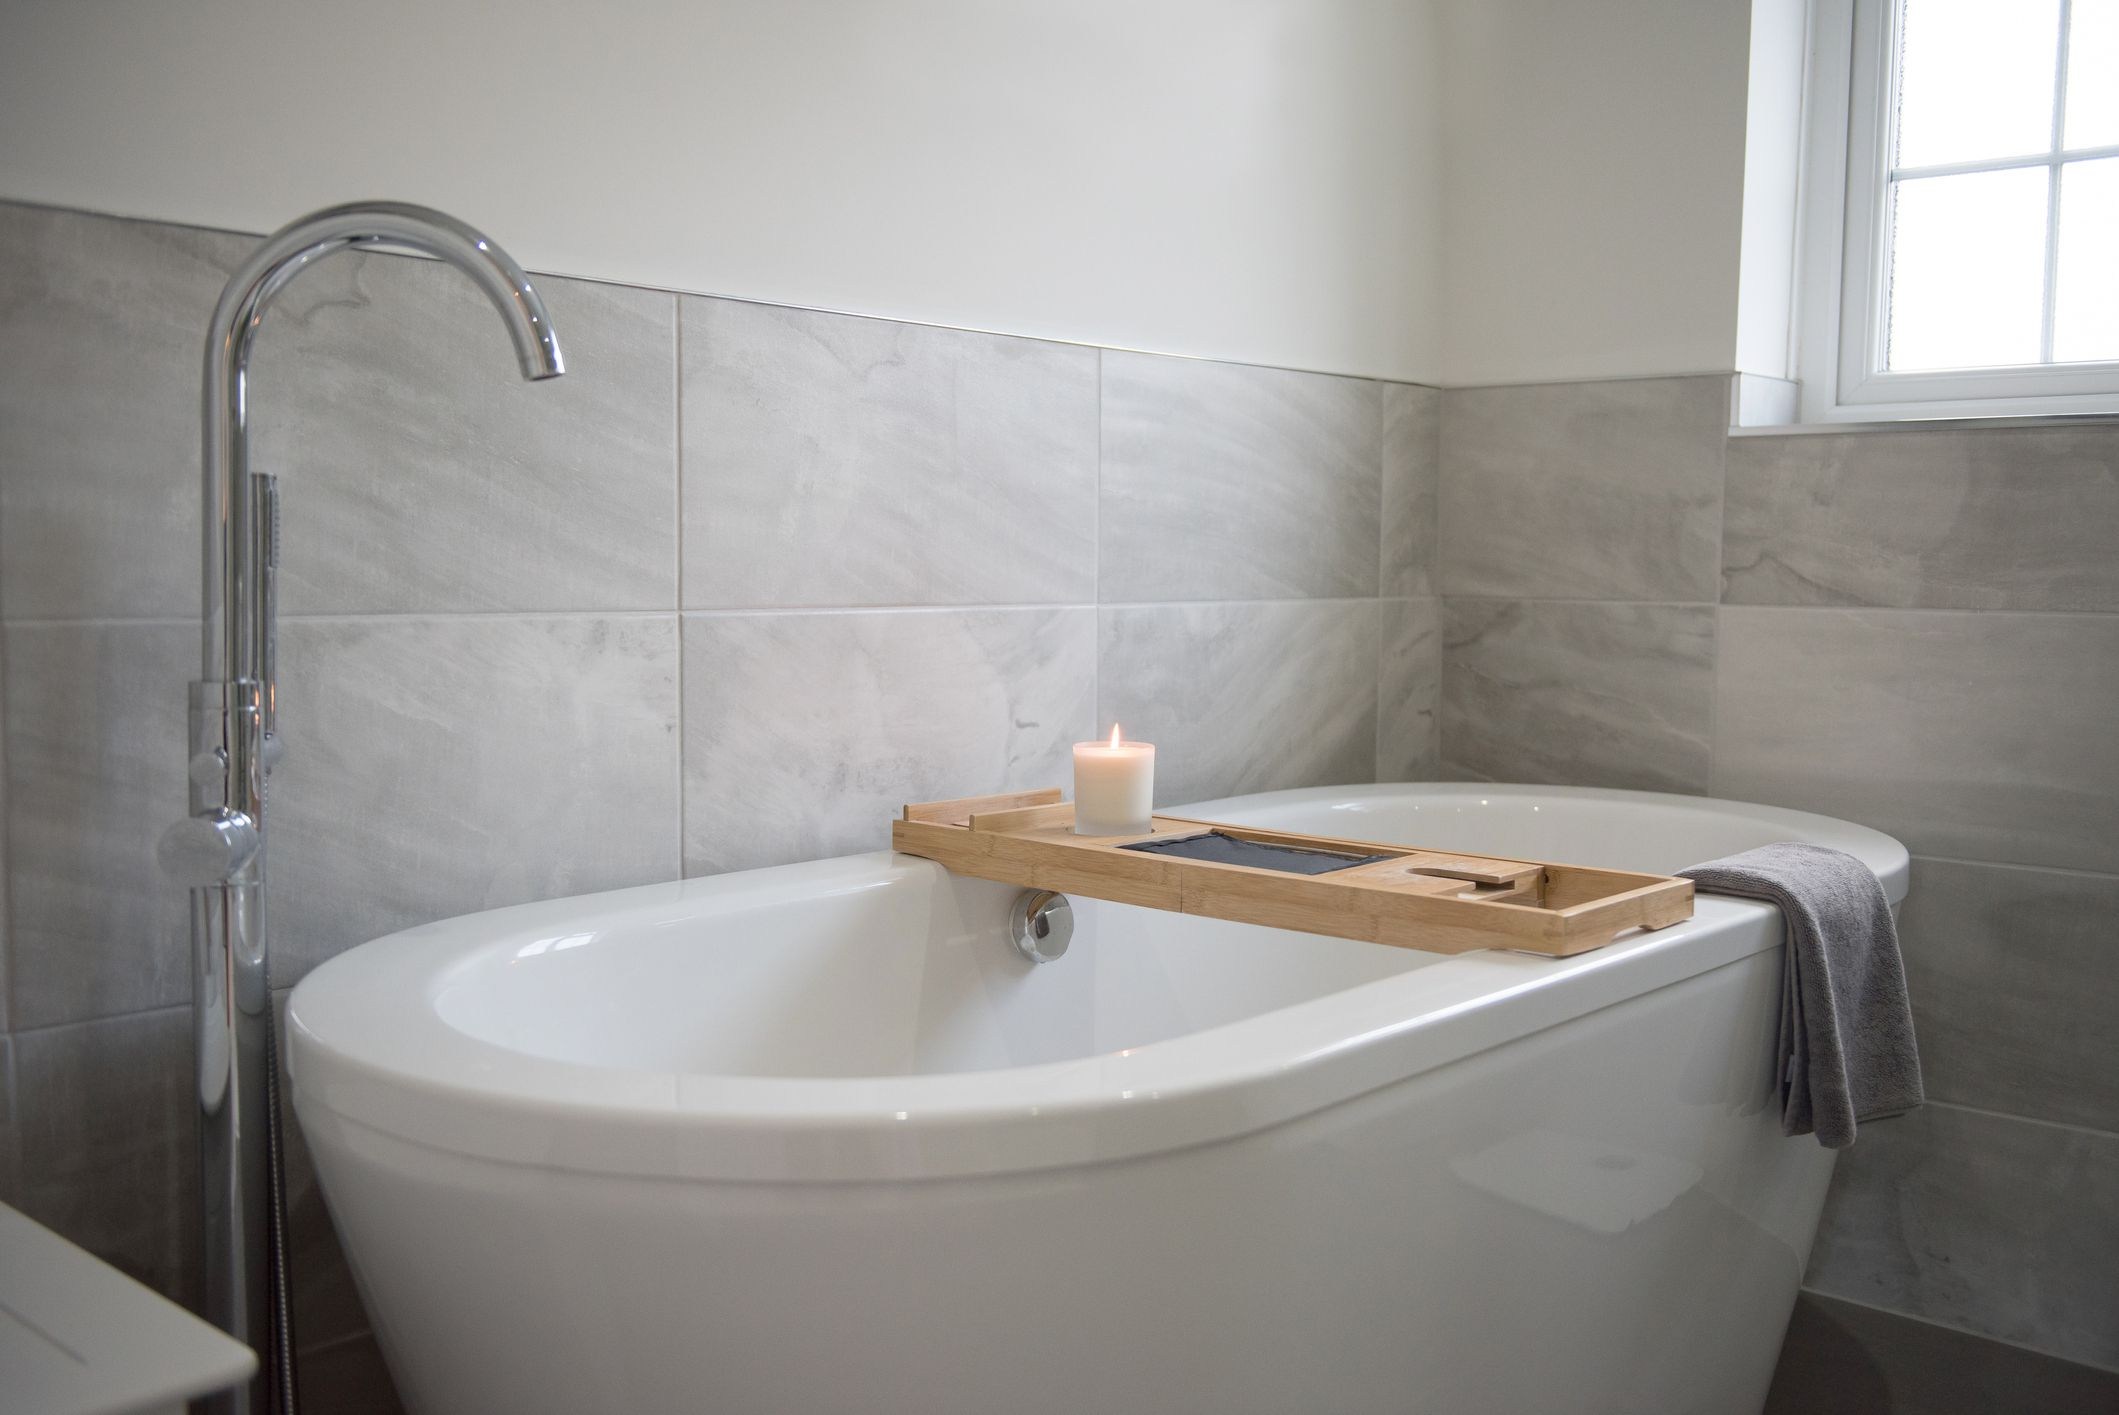 The 10 Best Bathtub Trays of 2021